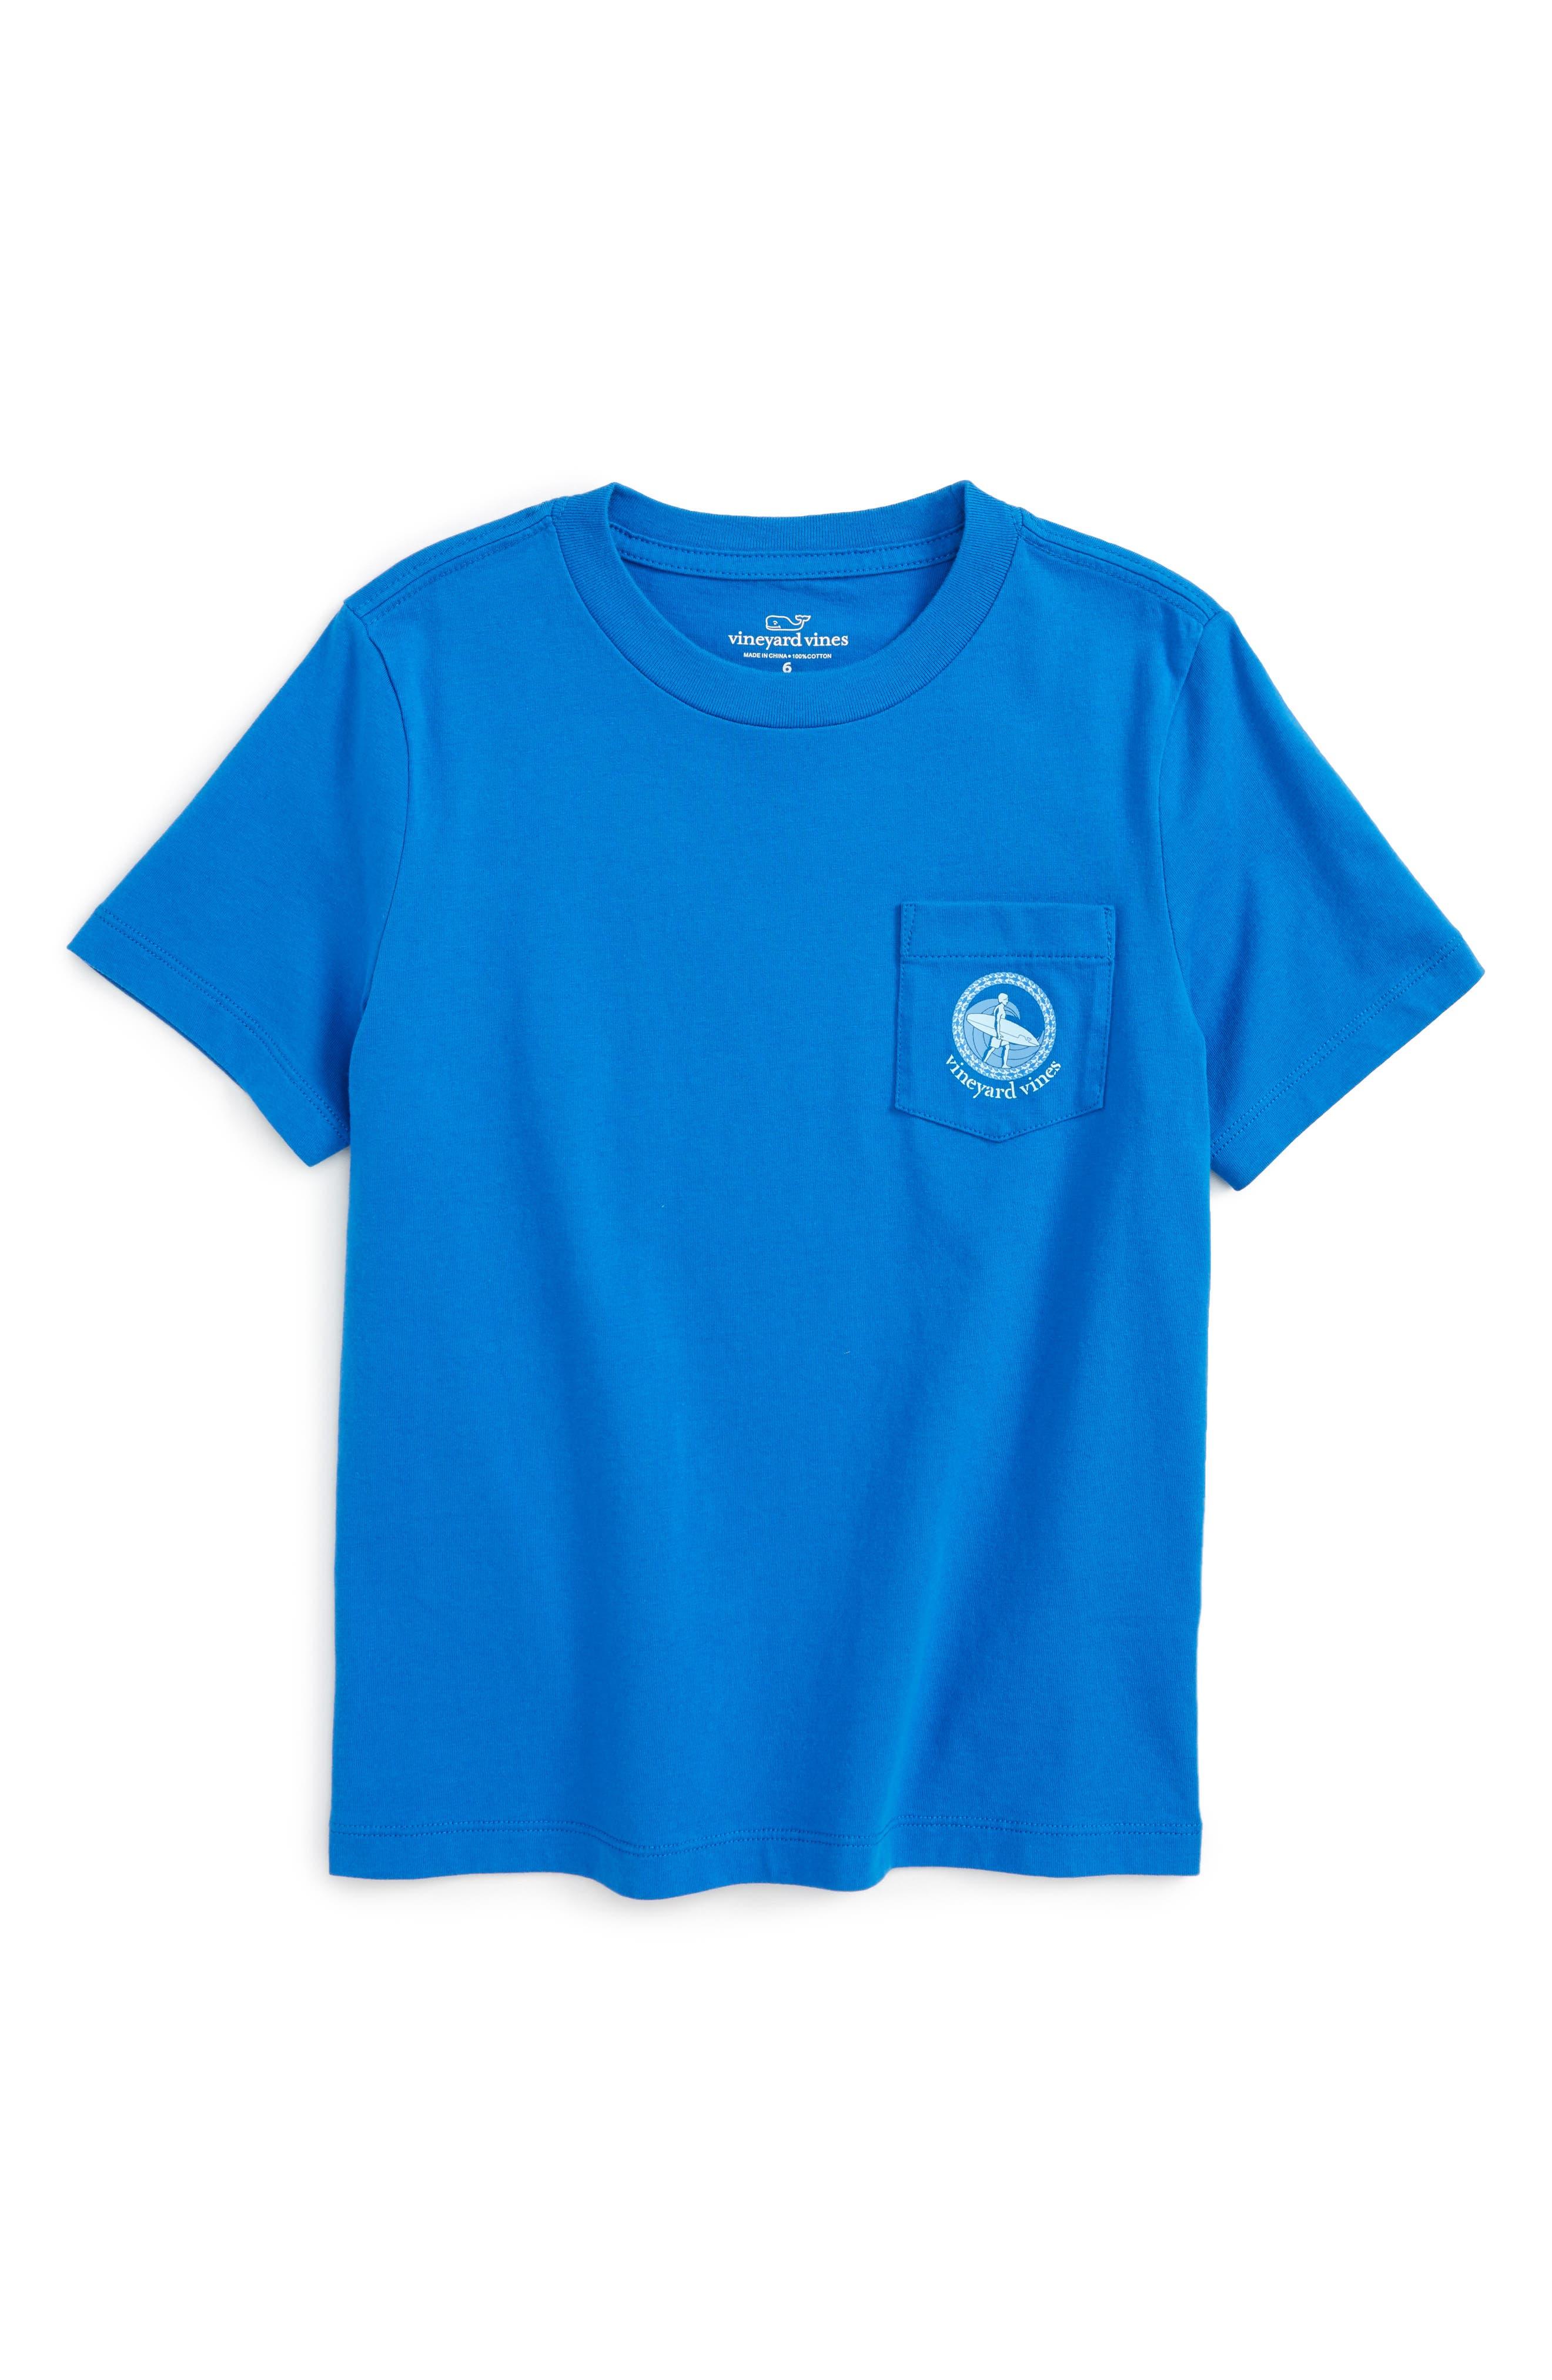 Vineyard Vines Surf Wave T-Shirt (Toddler Boys, Little Boys & Big Boys)